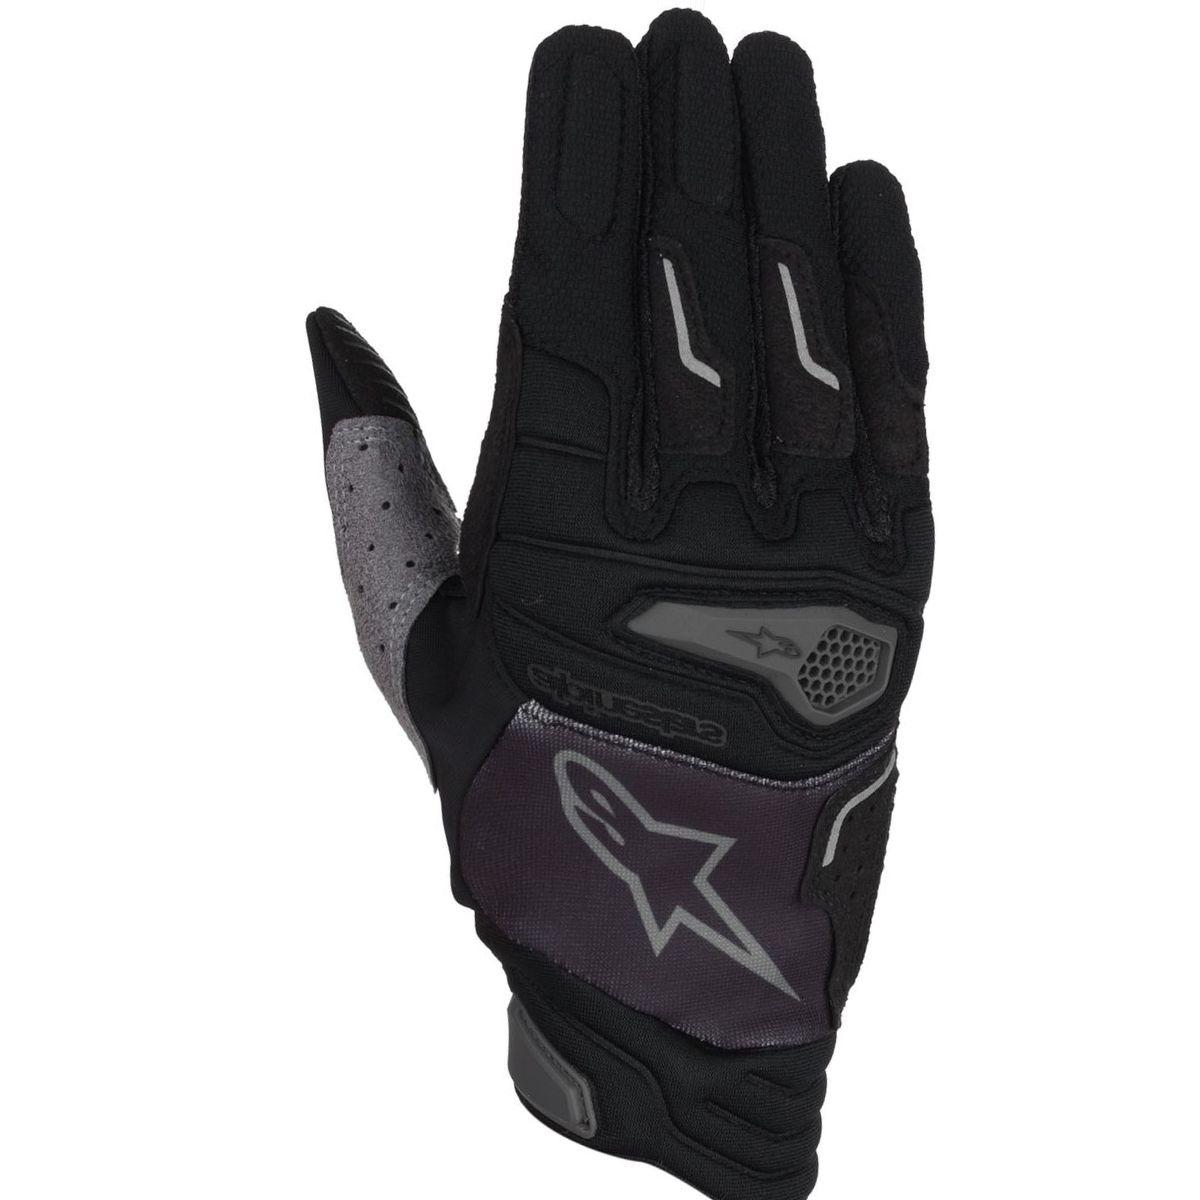 Alpinestars Drop Pro Glove - Men's